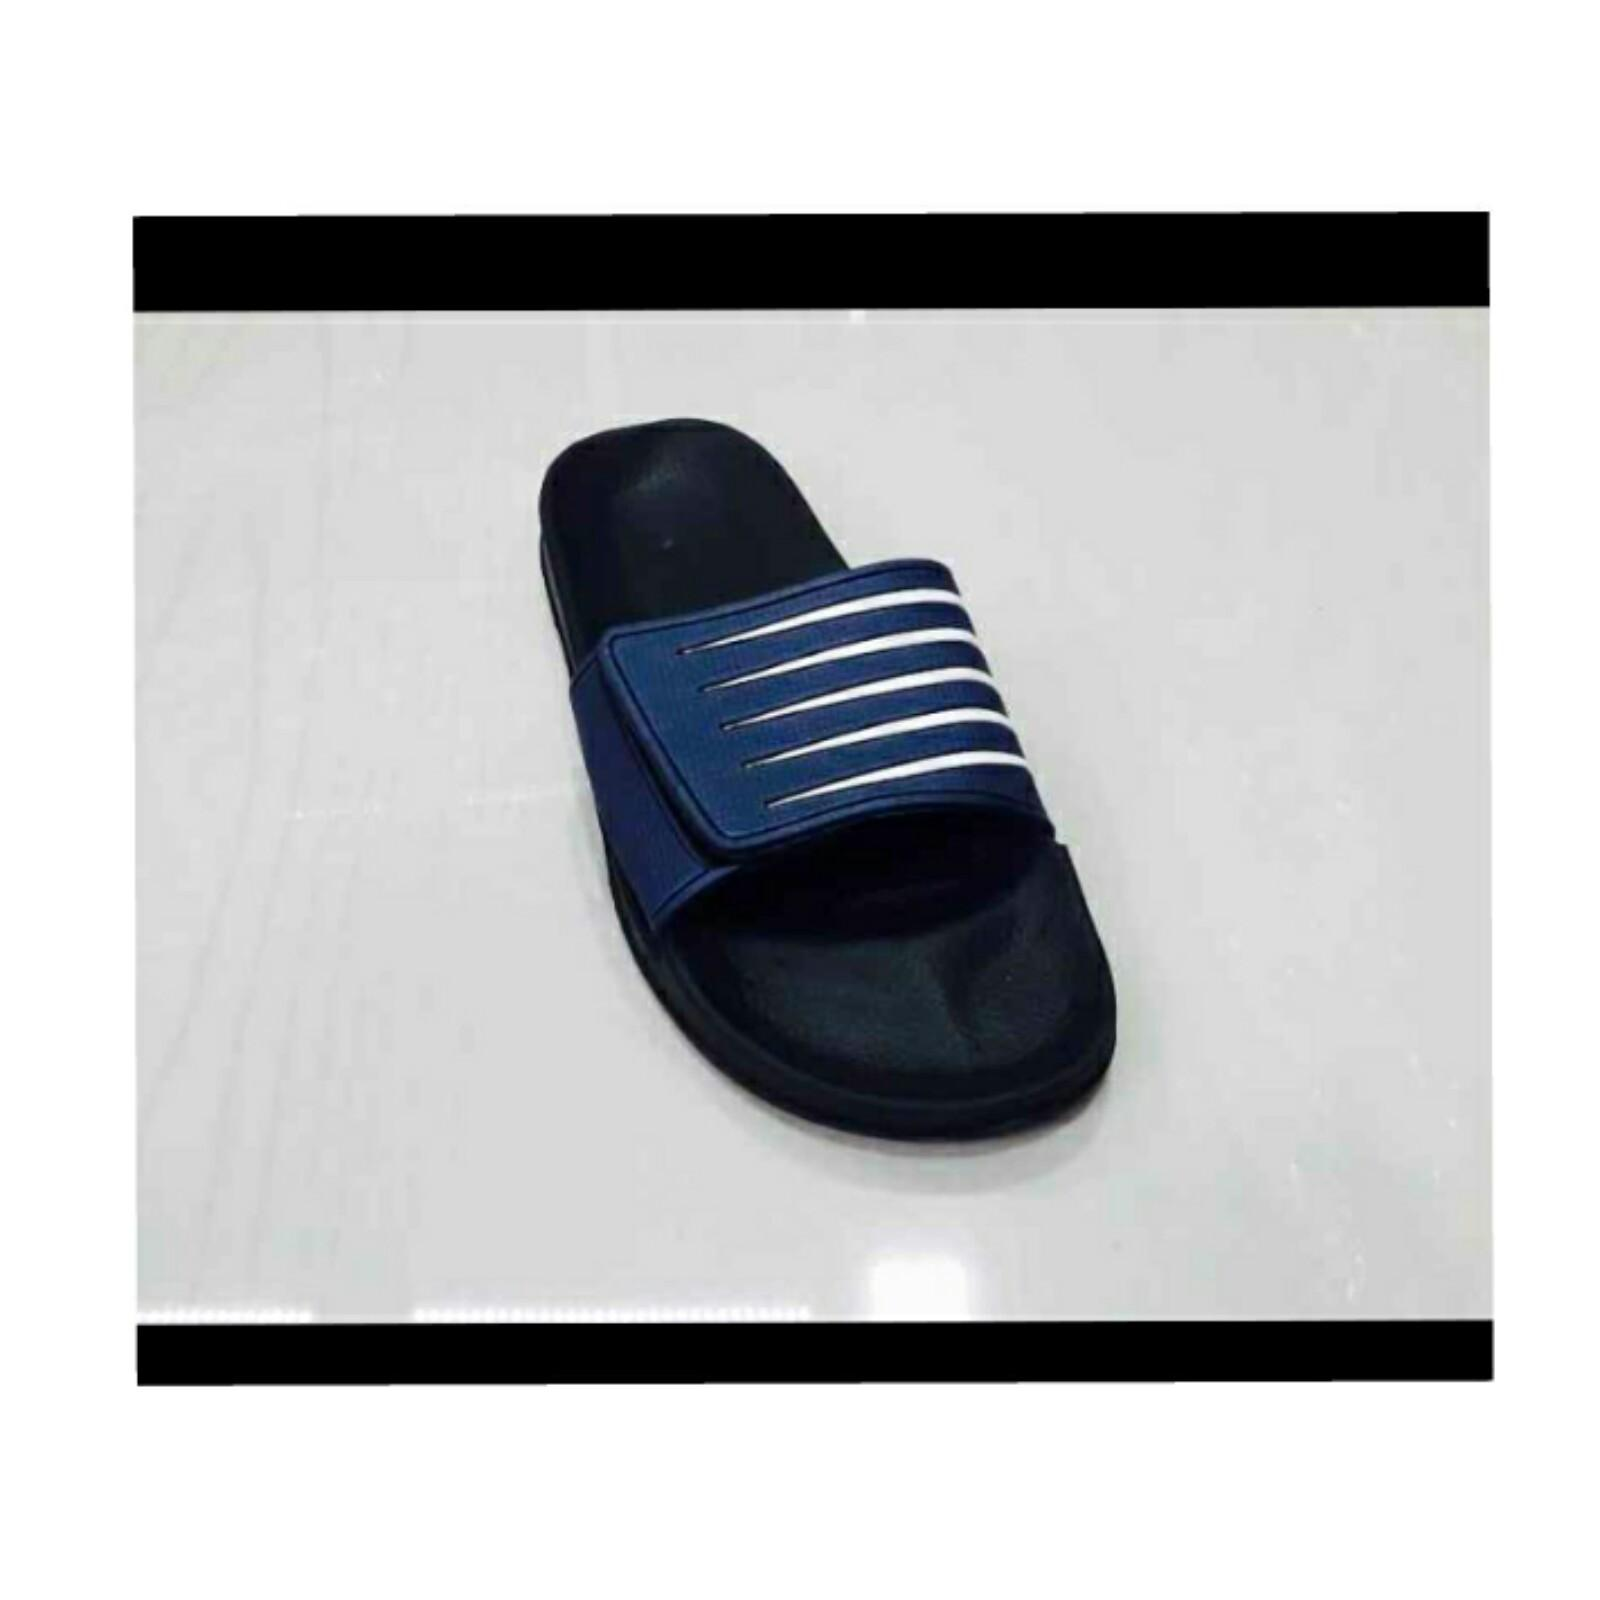 ee1812e21 Shoes in Sri Lanka | Latest Fashion Mens Shoes in Sri Lanka - Daraz.lk